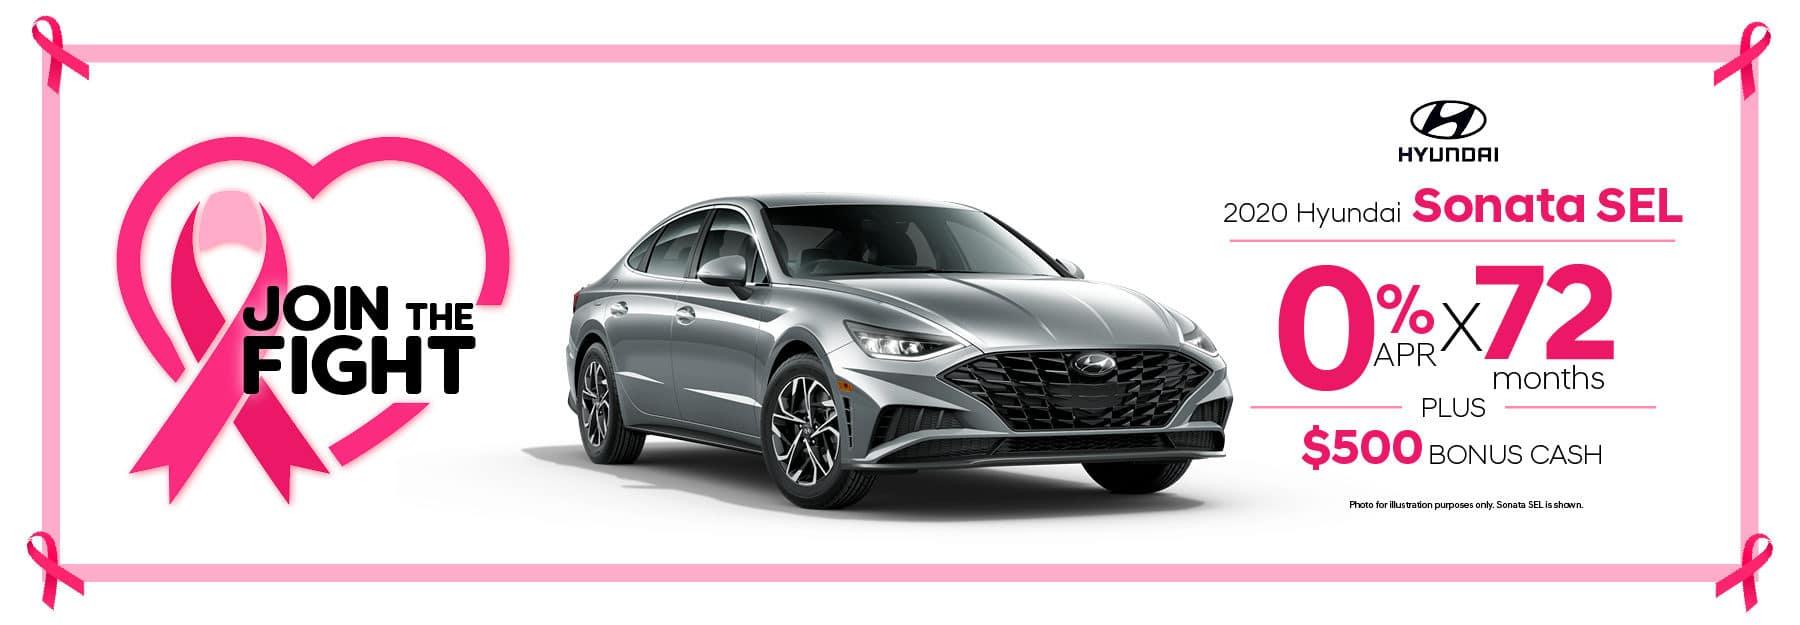 0% APR for 72 months + $500 bonus cash on 2020 Hyundai Sonata SEL